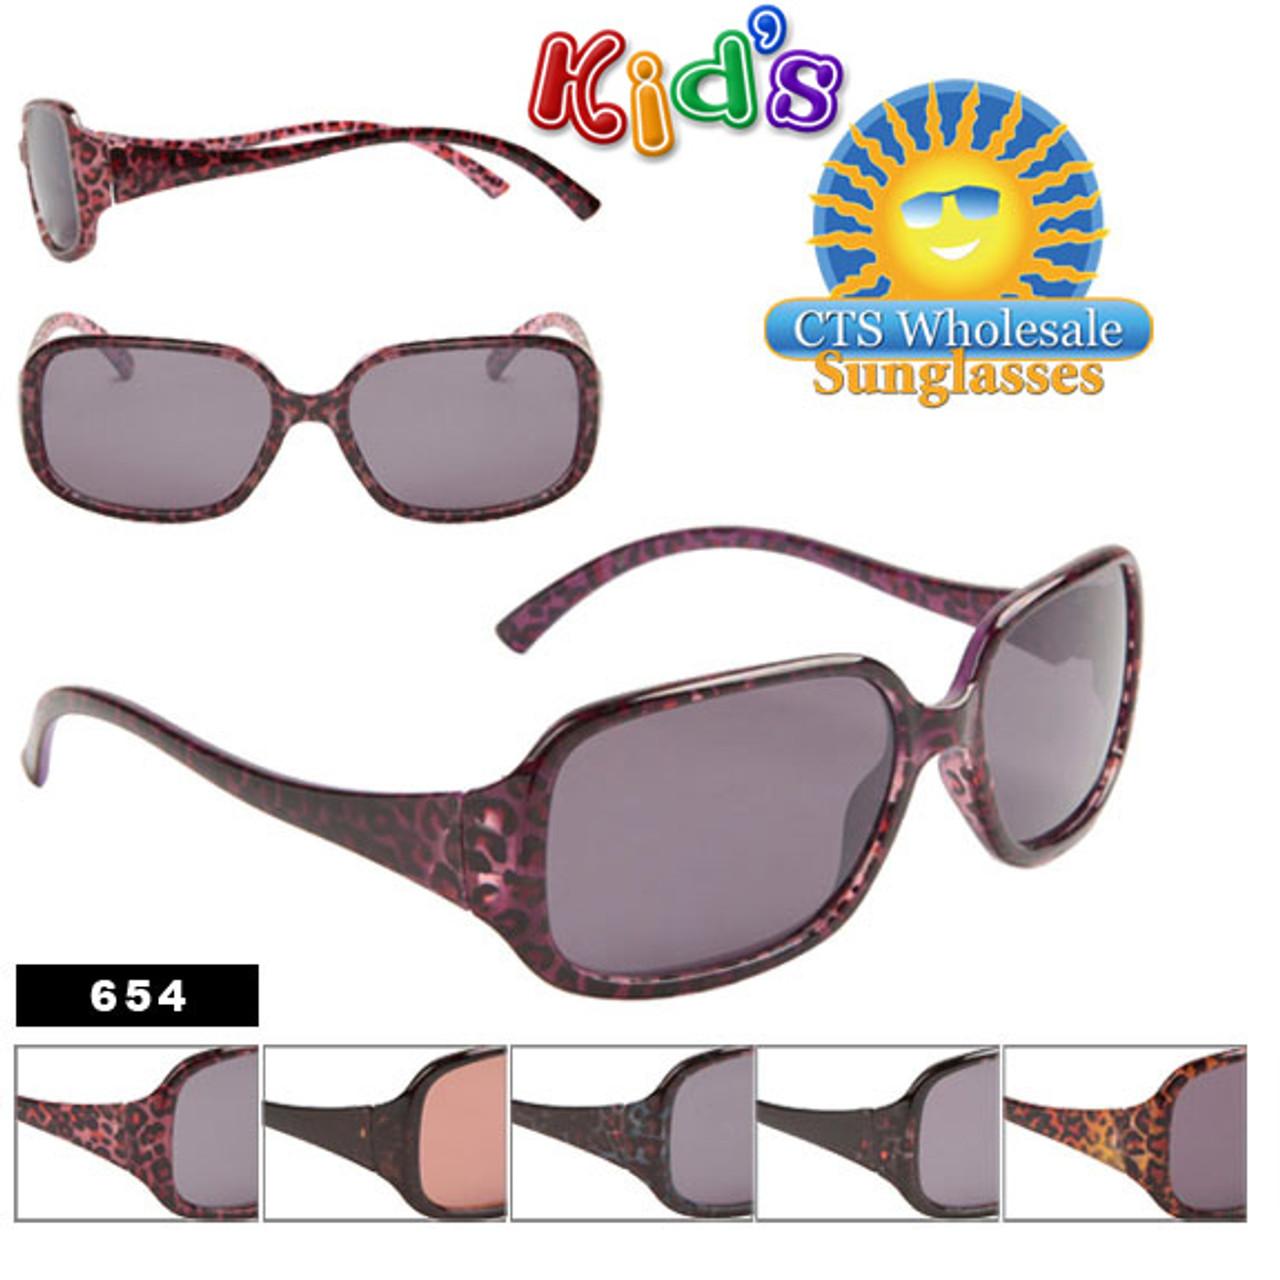 Wholesale Kids Sunglasses!